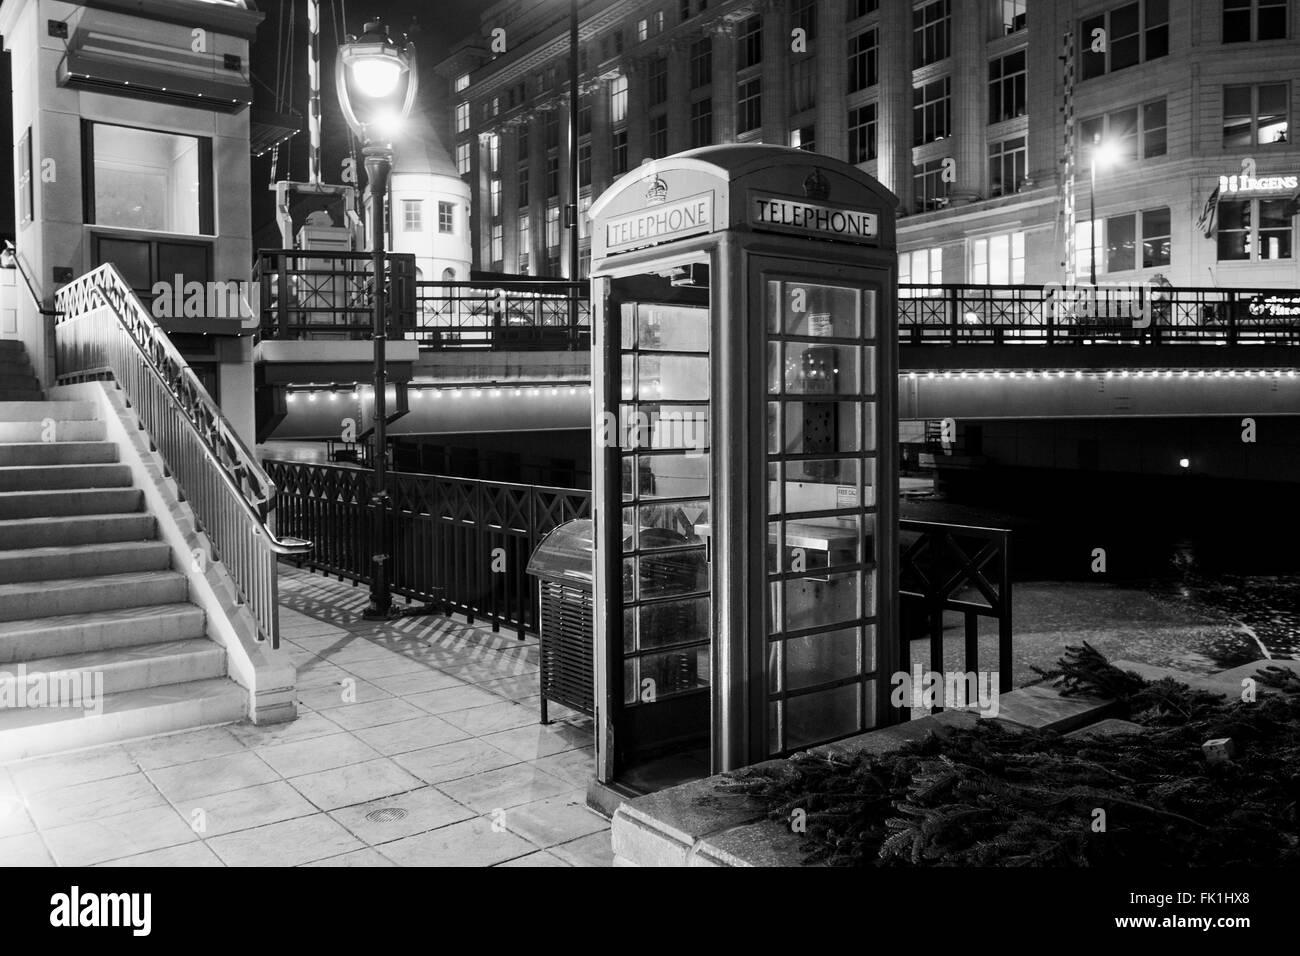 London telephone booth night black white stock image